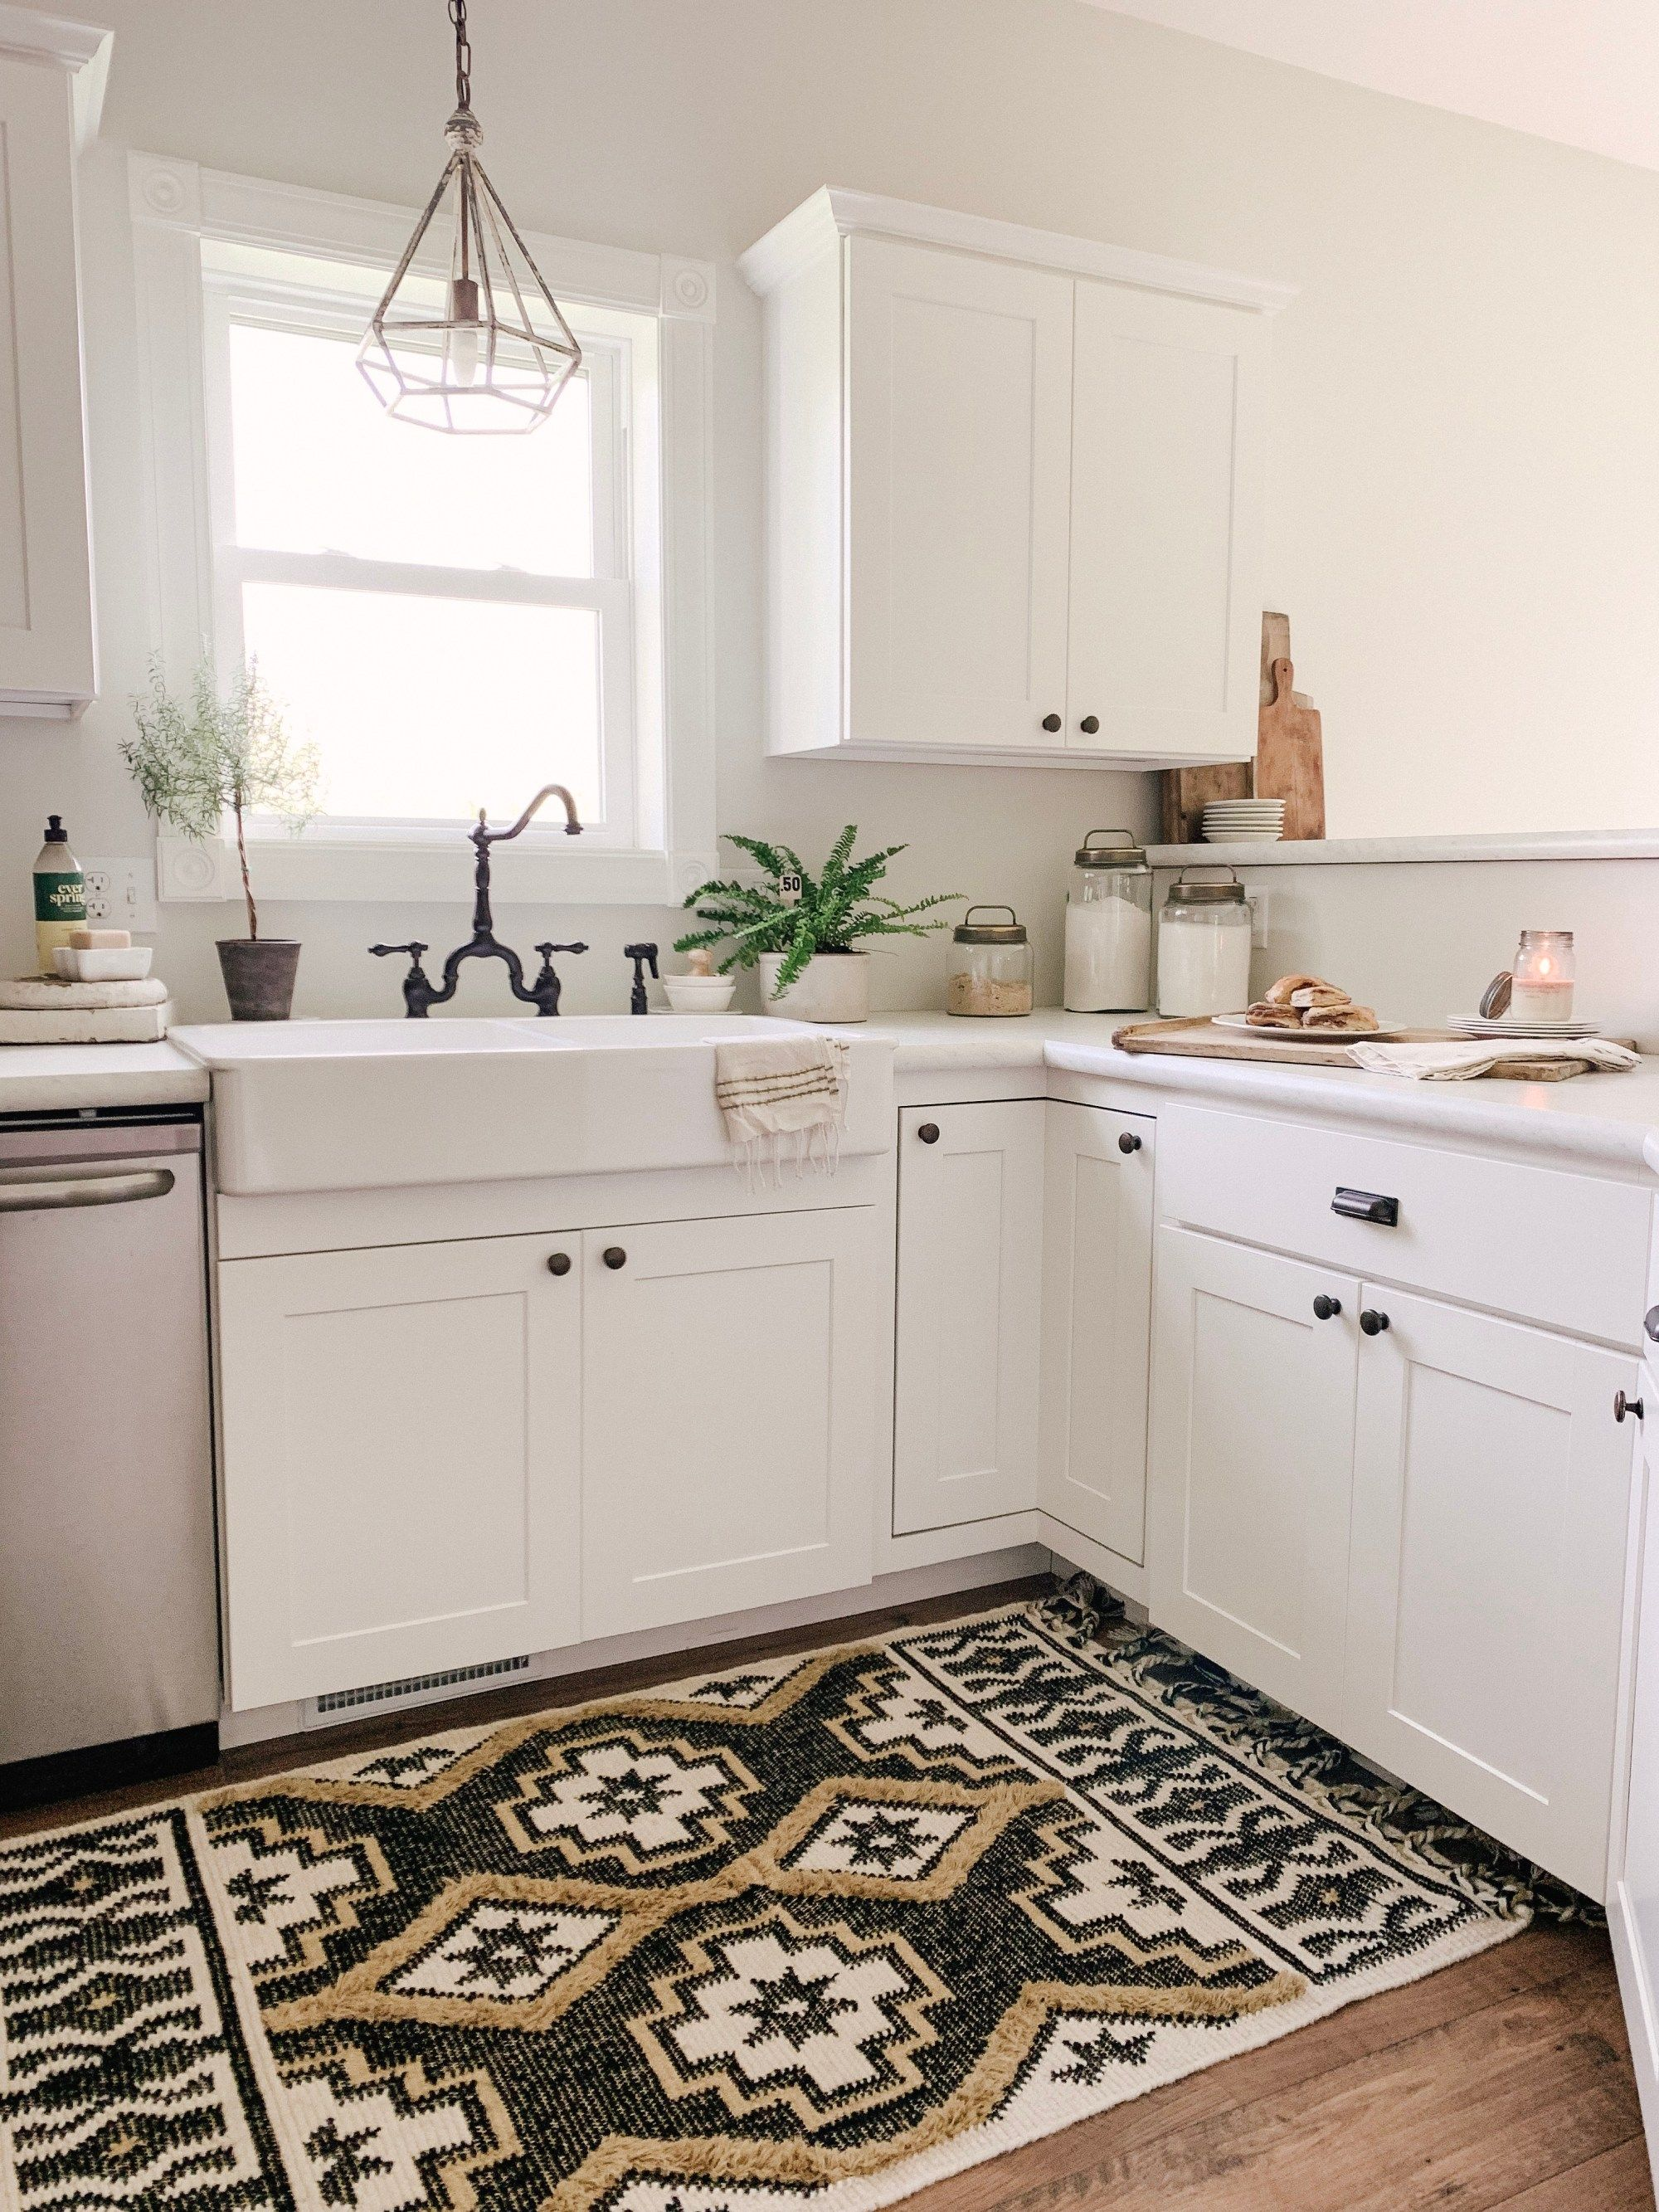 Laminate Carrara Marble Kitchen Countertops Kitchen Countertops